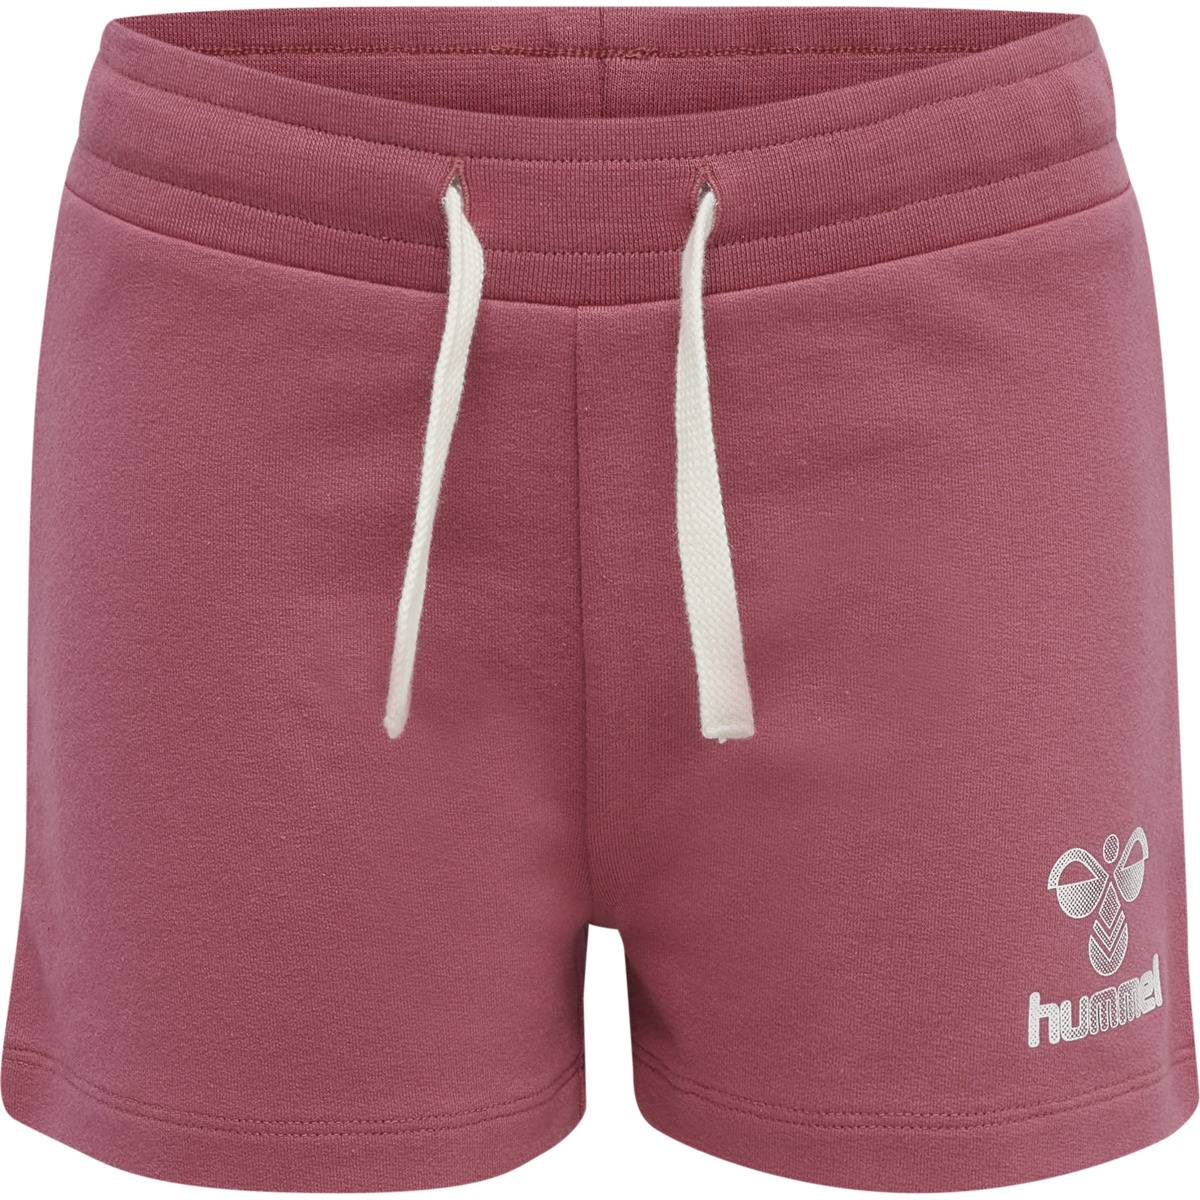 Hummel Proud shorts girl - rose wine